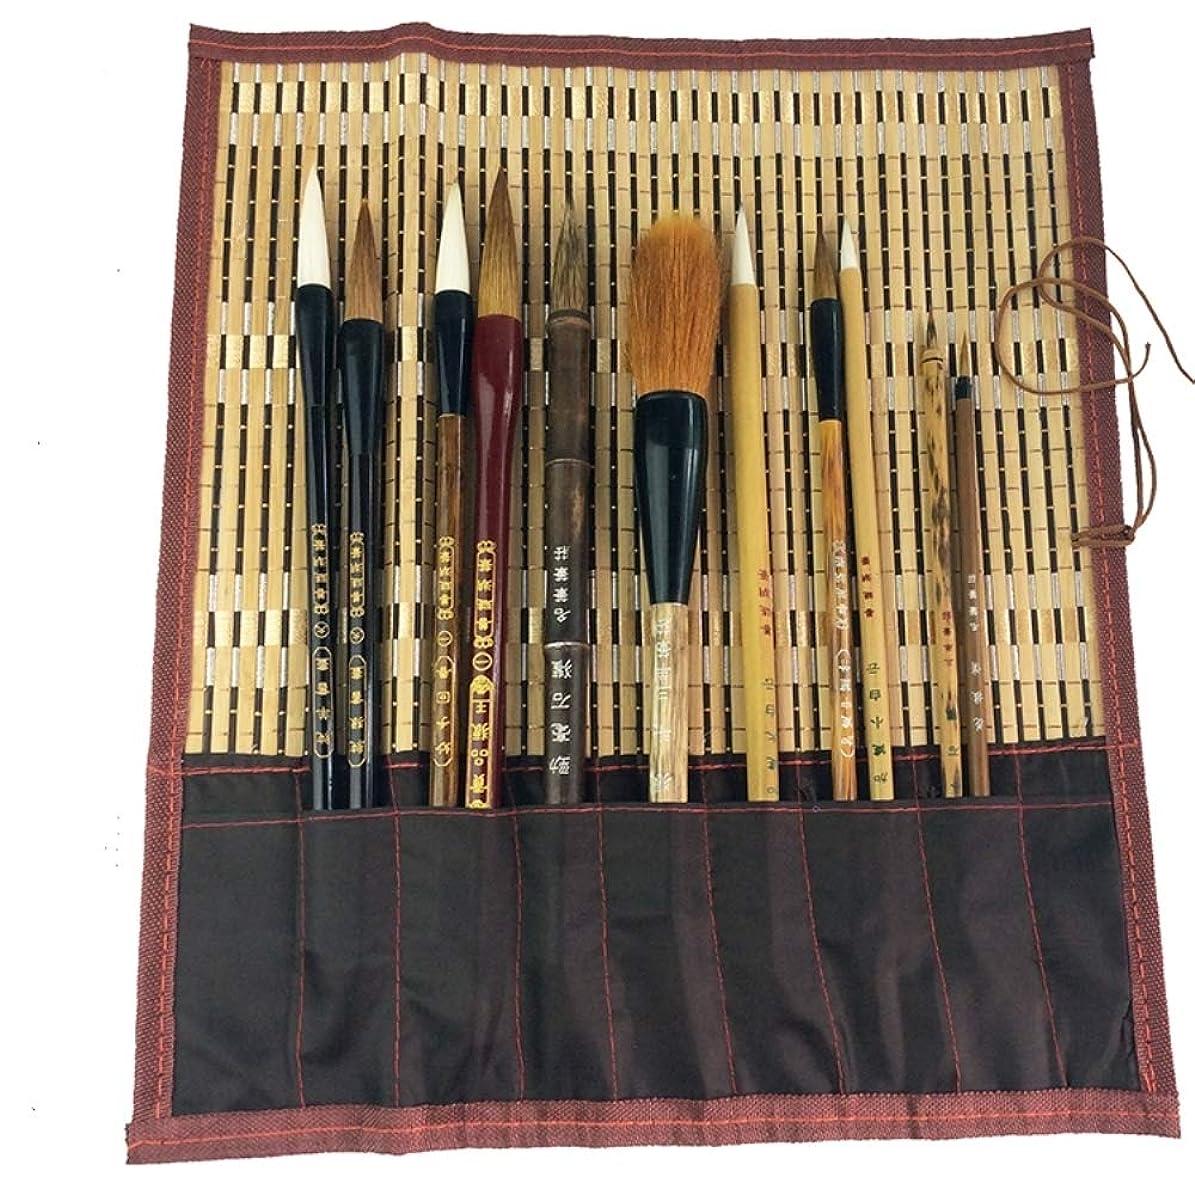 Shanlian Hubi Claborate-Style 絵筆 水彩画筆 漢字筆セット 日本語 Sumi ペインティング 描画ブラシ 11本/セット+ロールアップ 竹ブラシホルダー